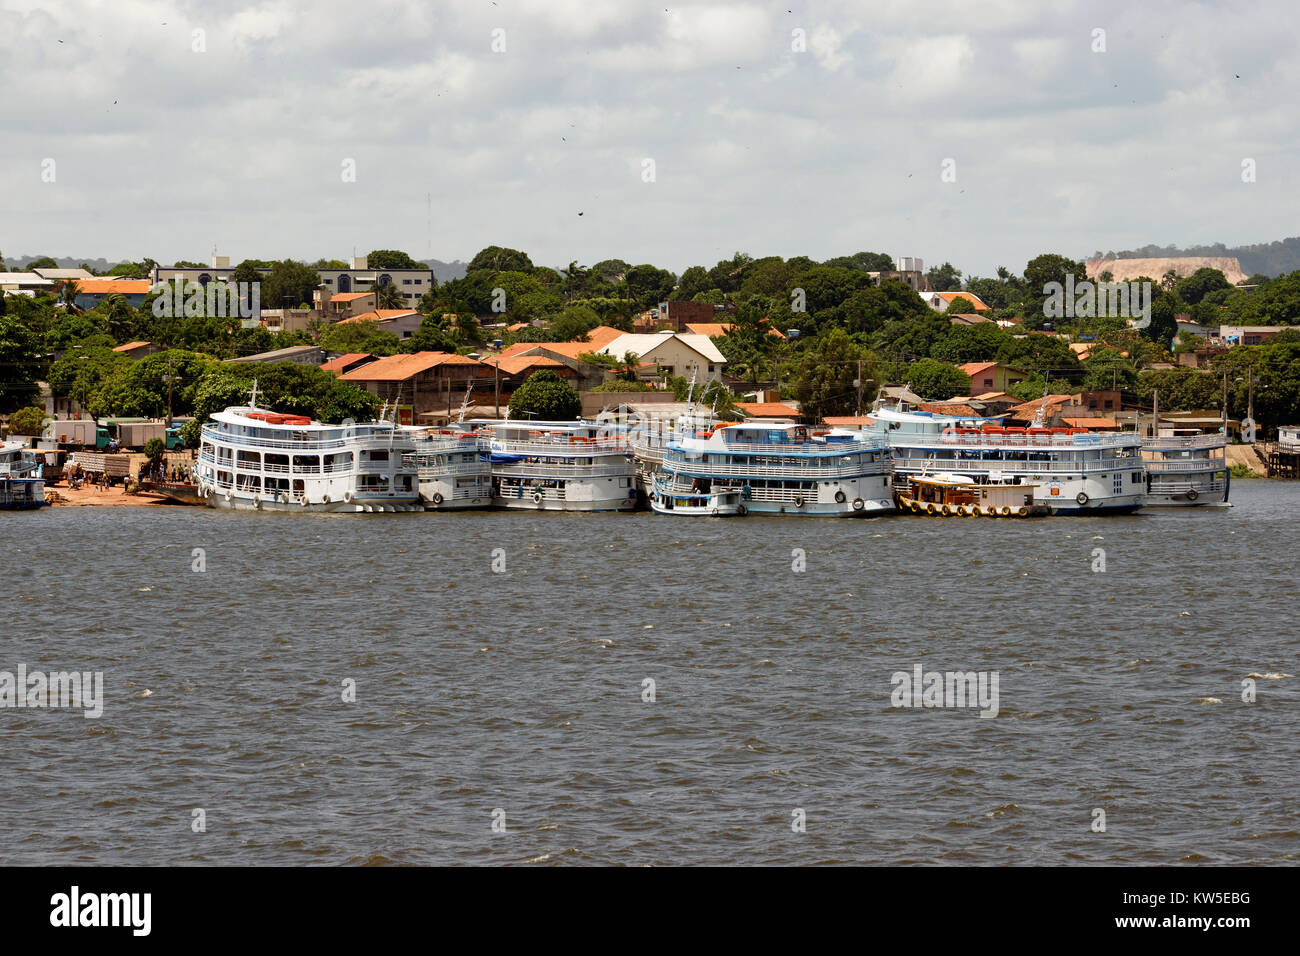 Amazon riverboats docked at Santarem, Brazil. - Stock Image